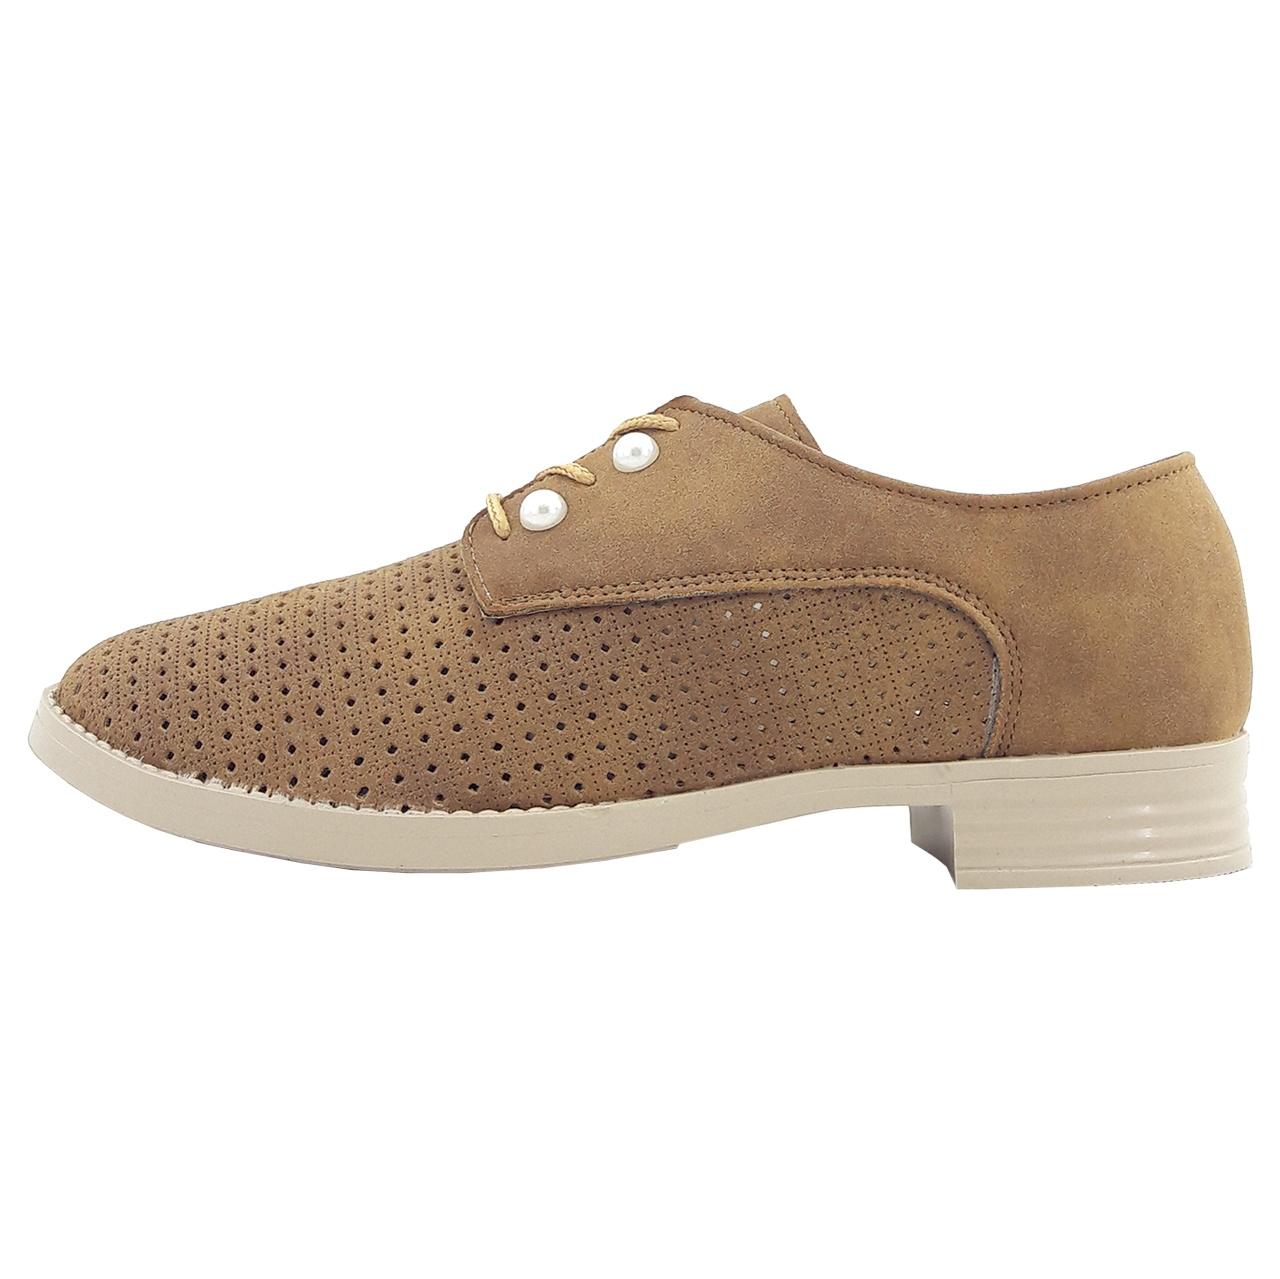 کفش نه مدل Aylr koba.brw.srkh01